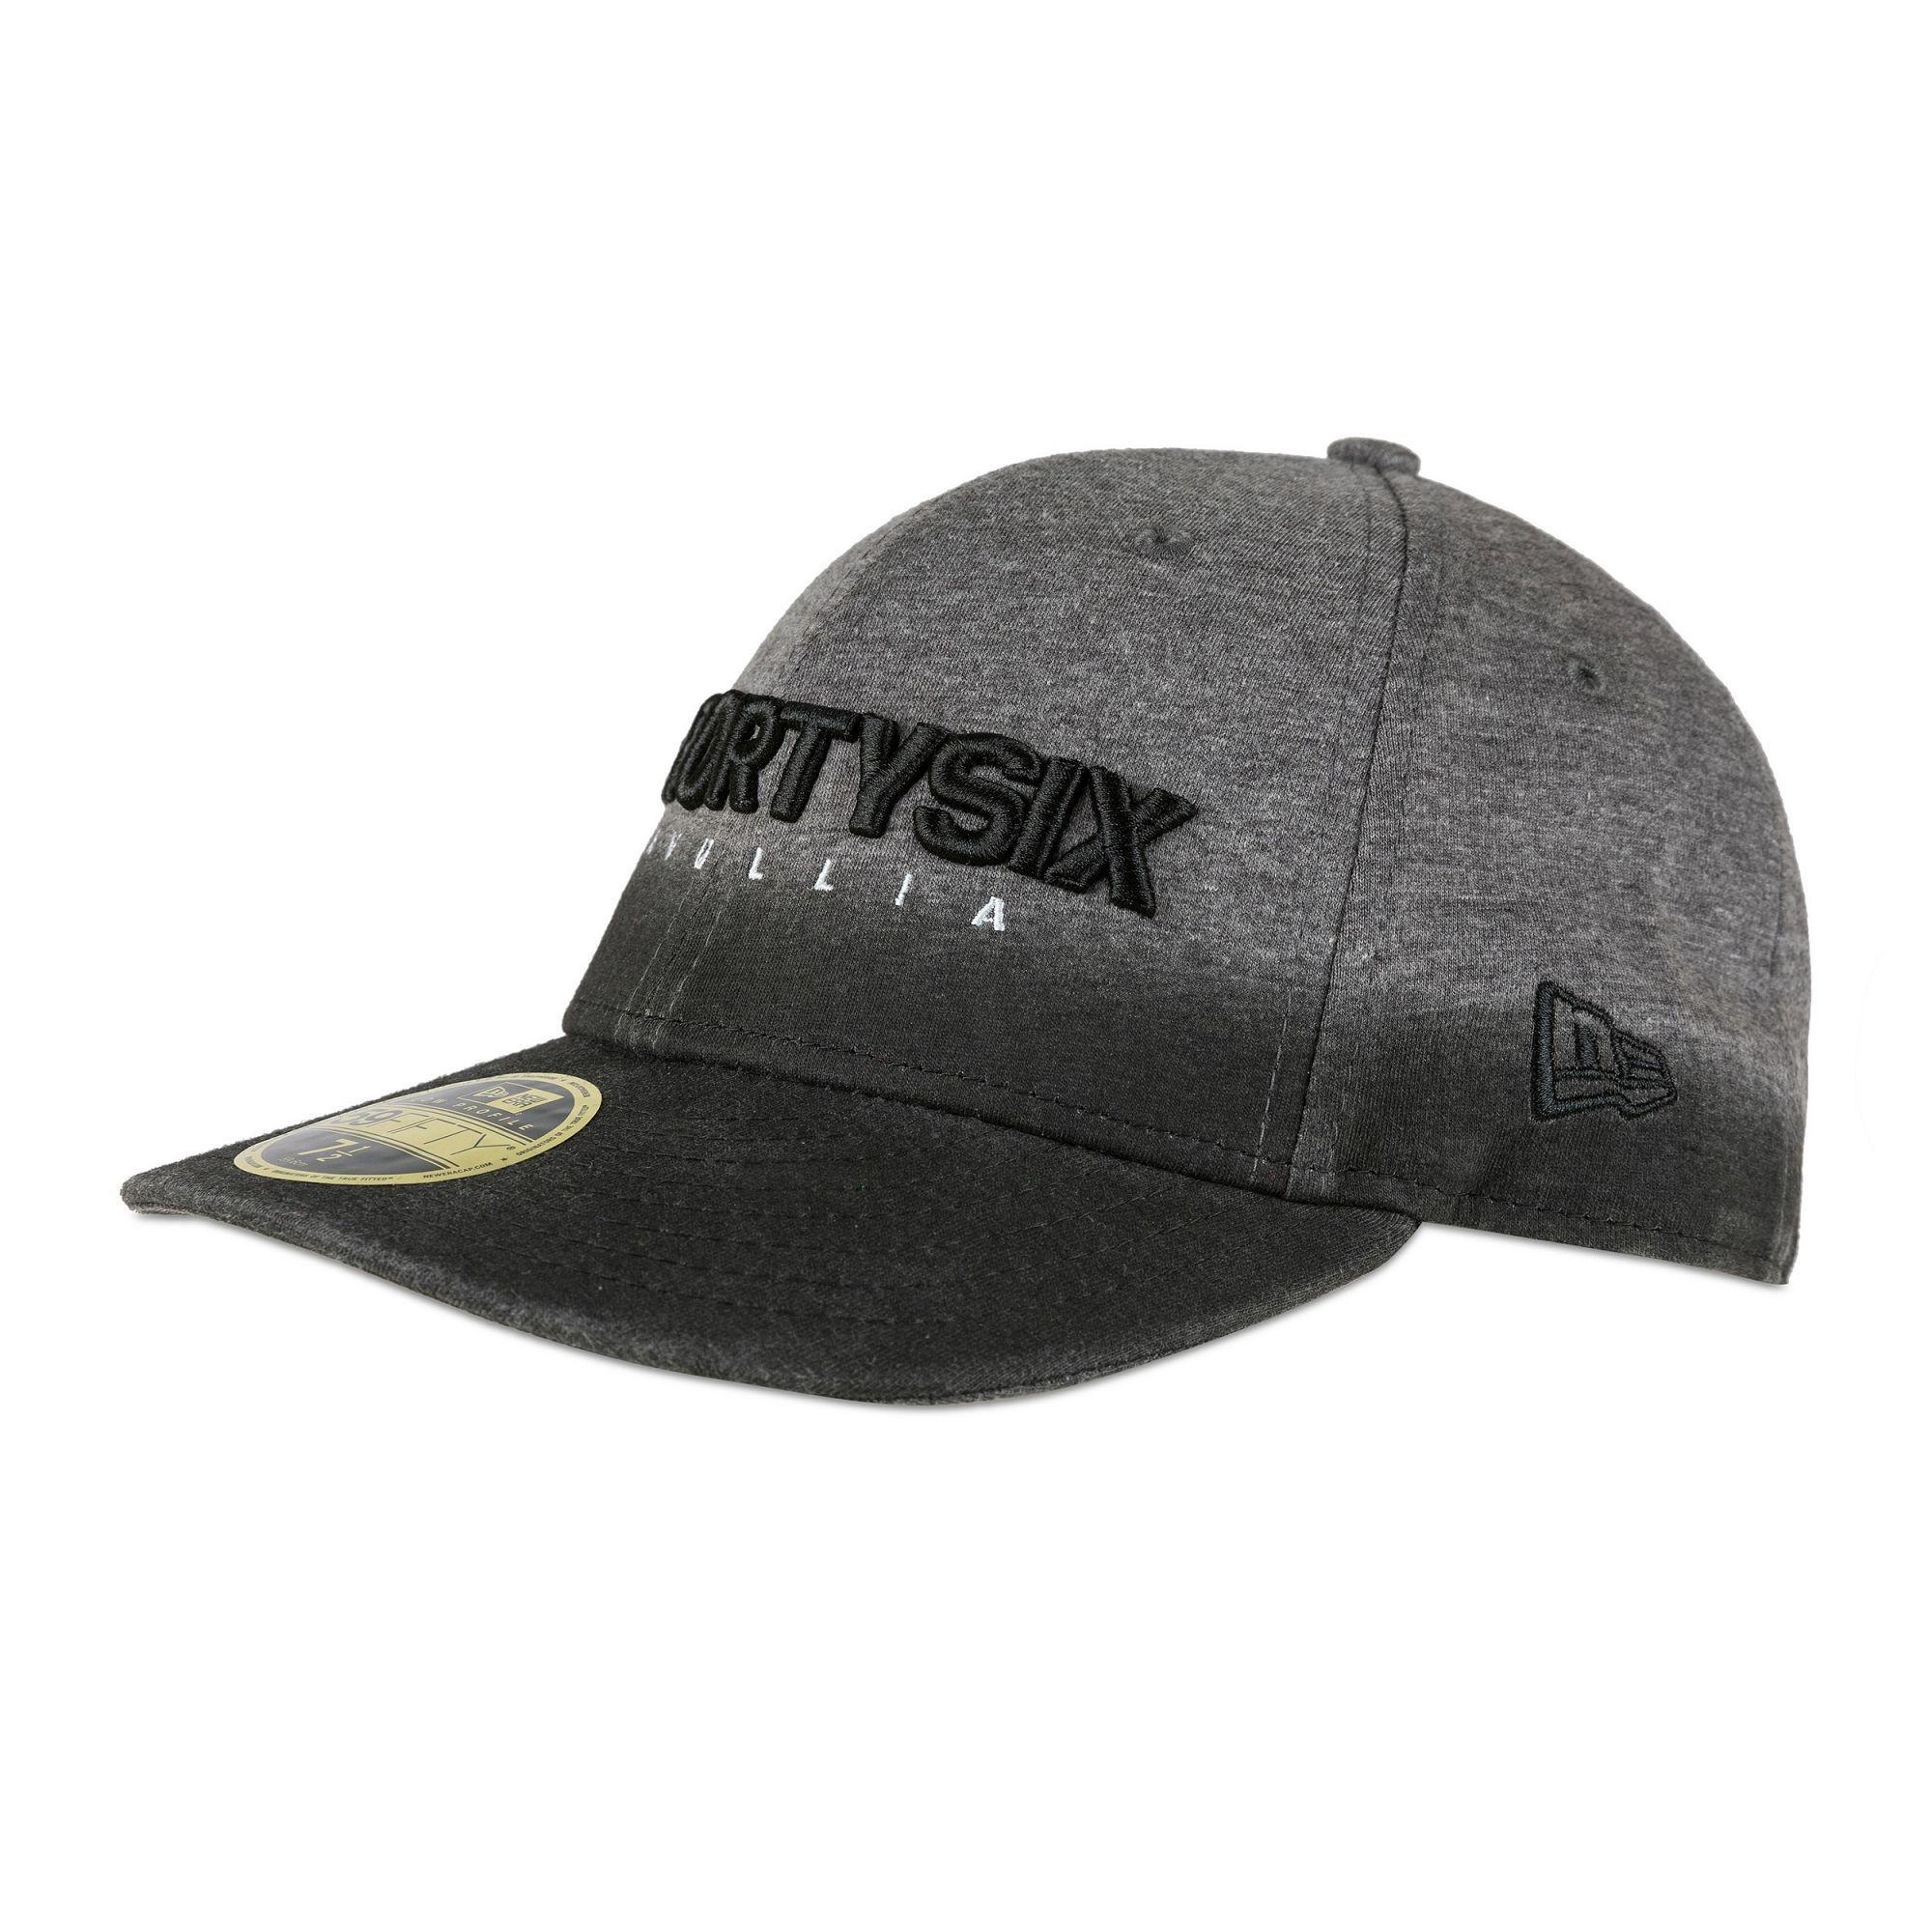 0486e8a17f8 New Era VR46 TheDoctor Cap